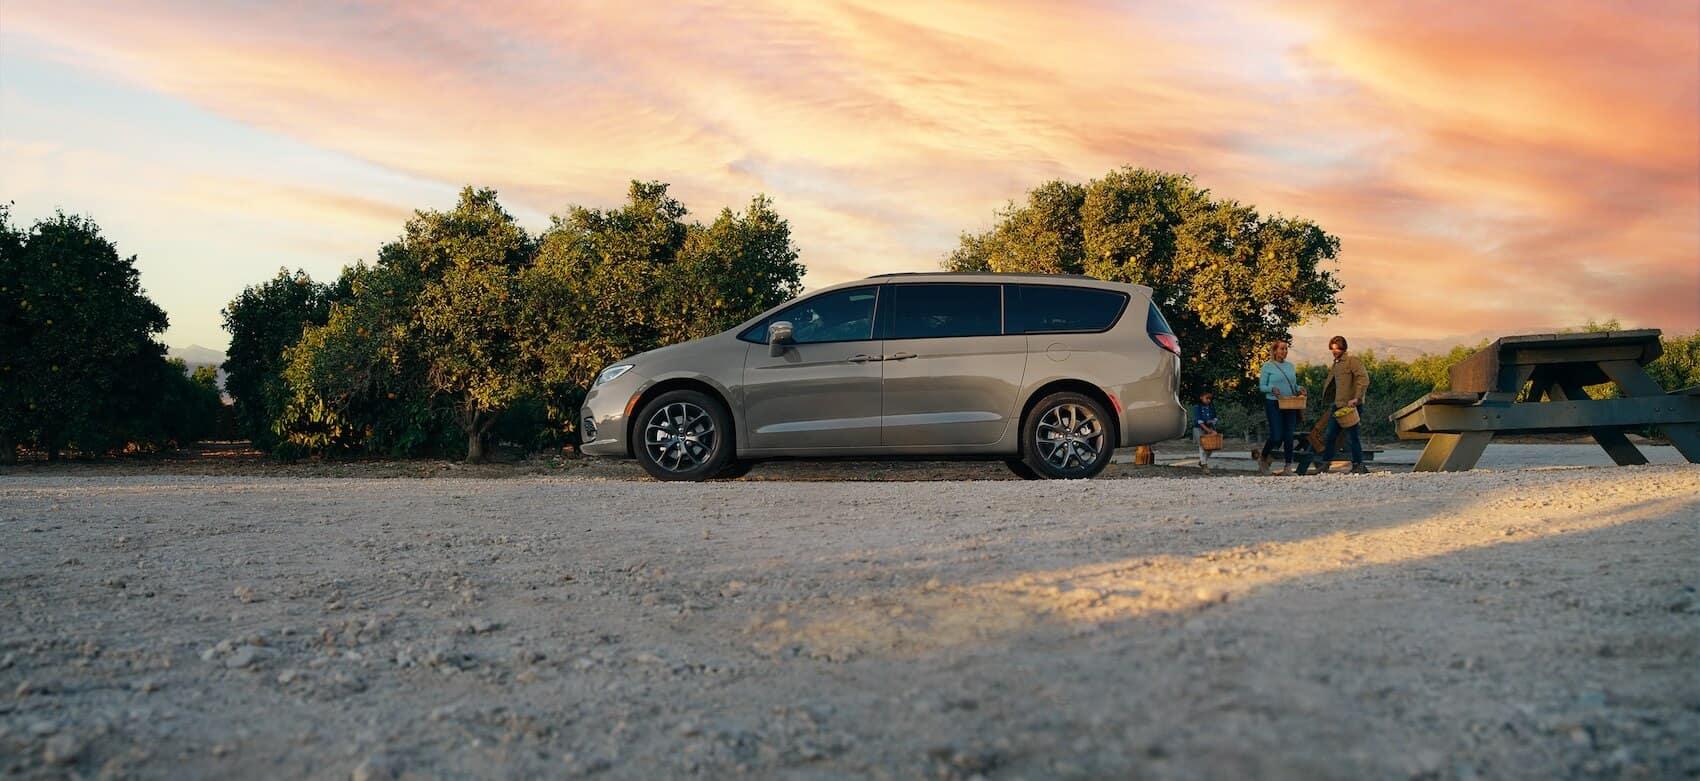 Chrysler Inventory near Findlay OH